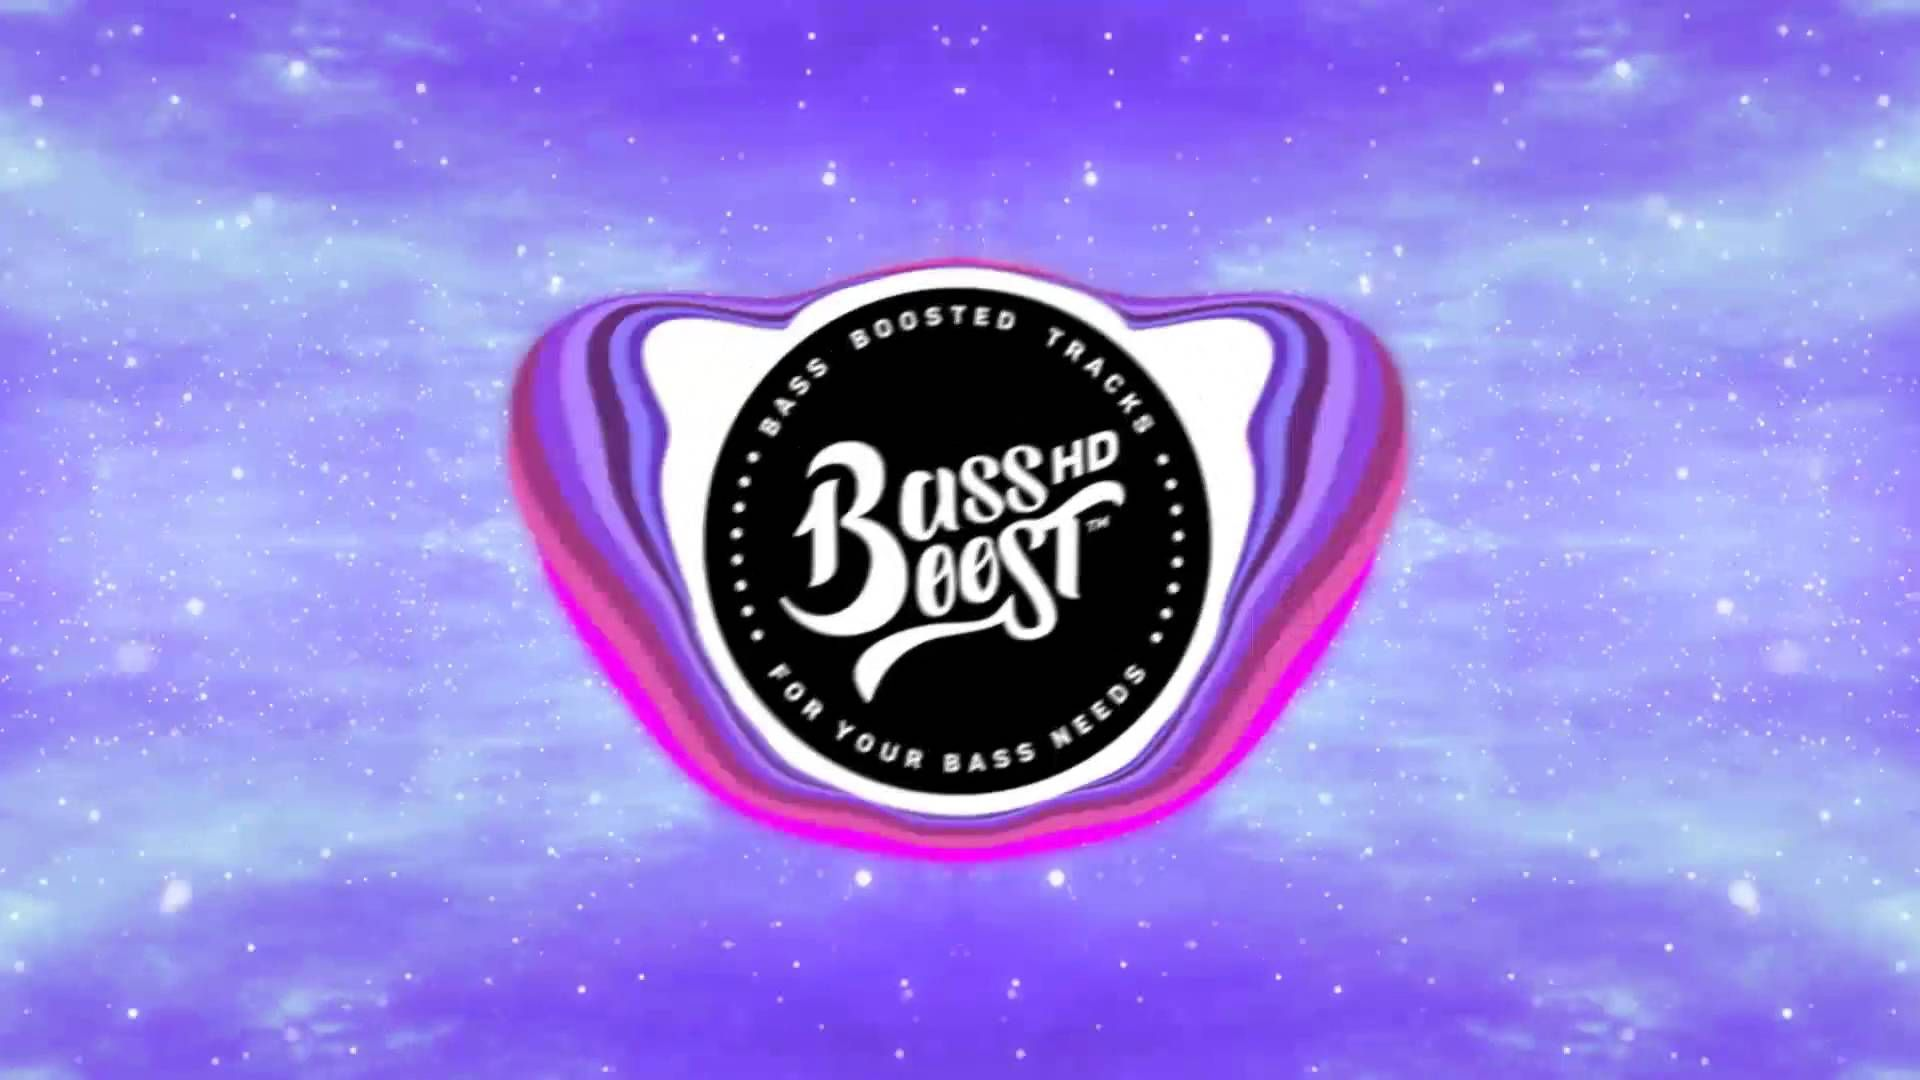 26carat What You Seek Bass Boosted Bass Boosting Twerk